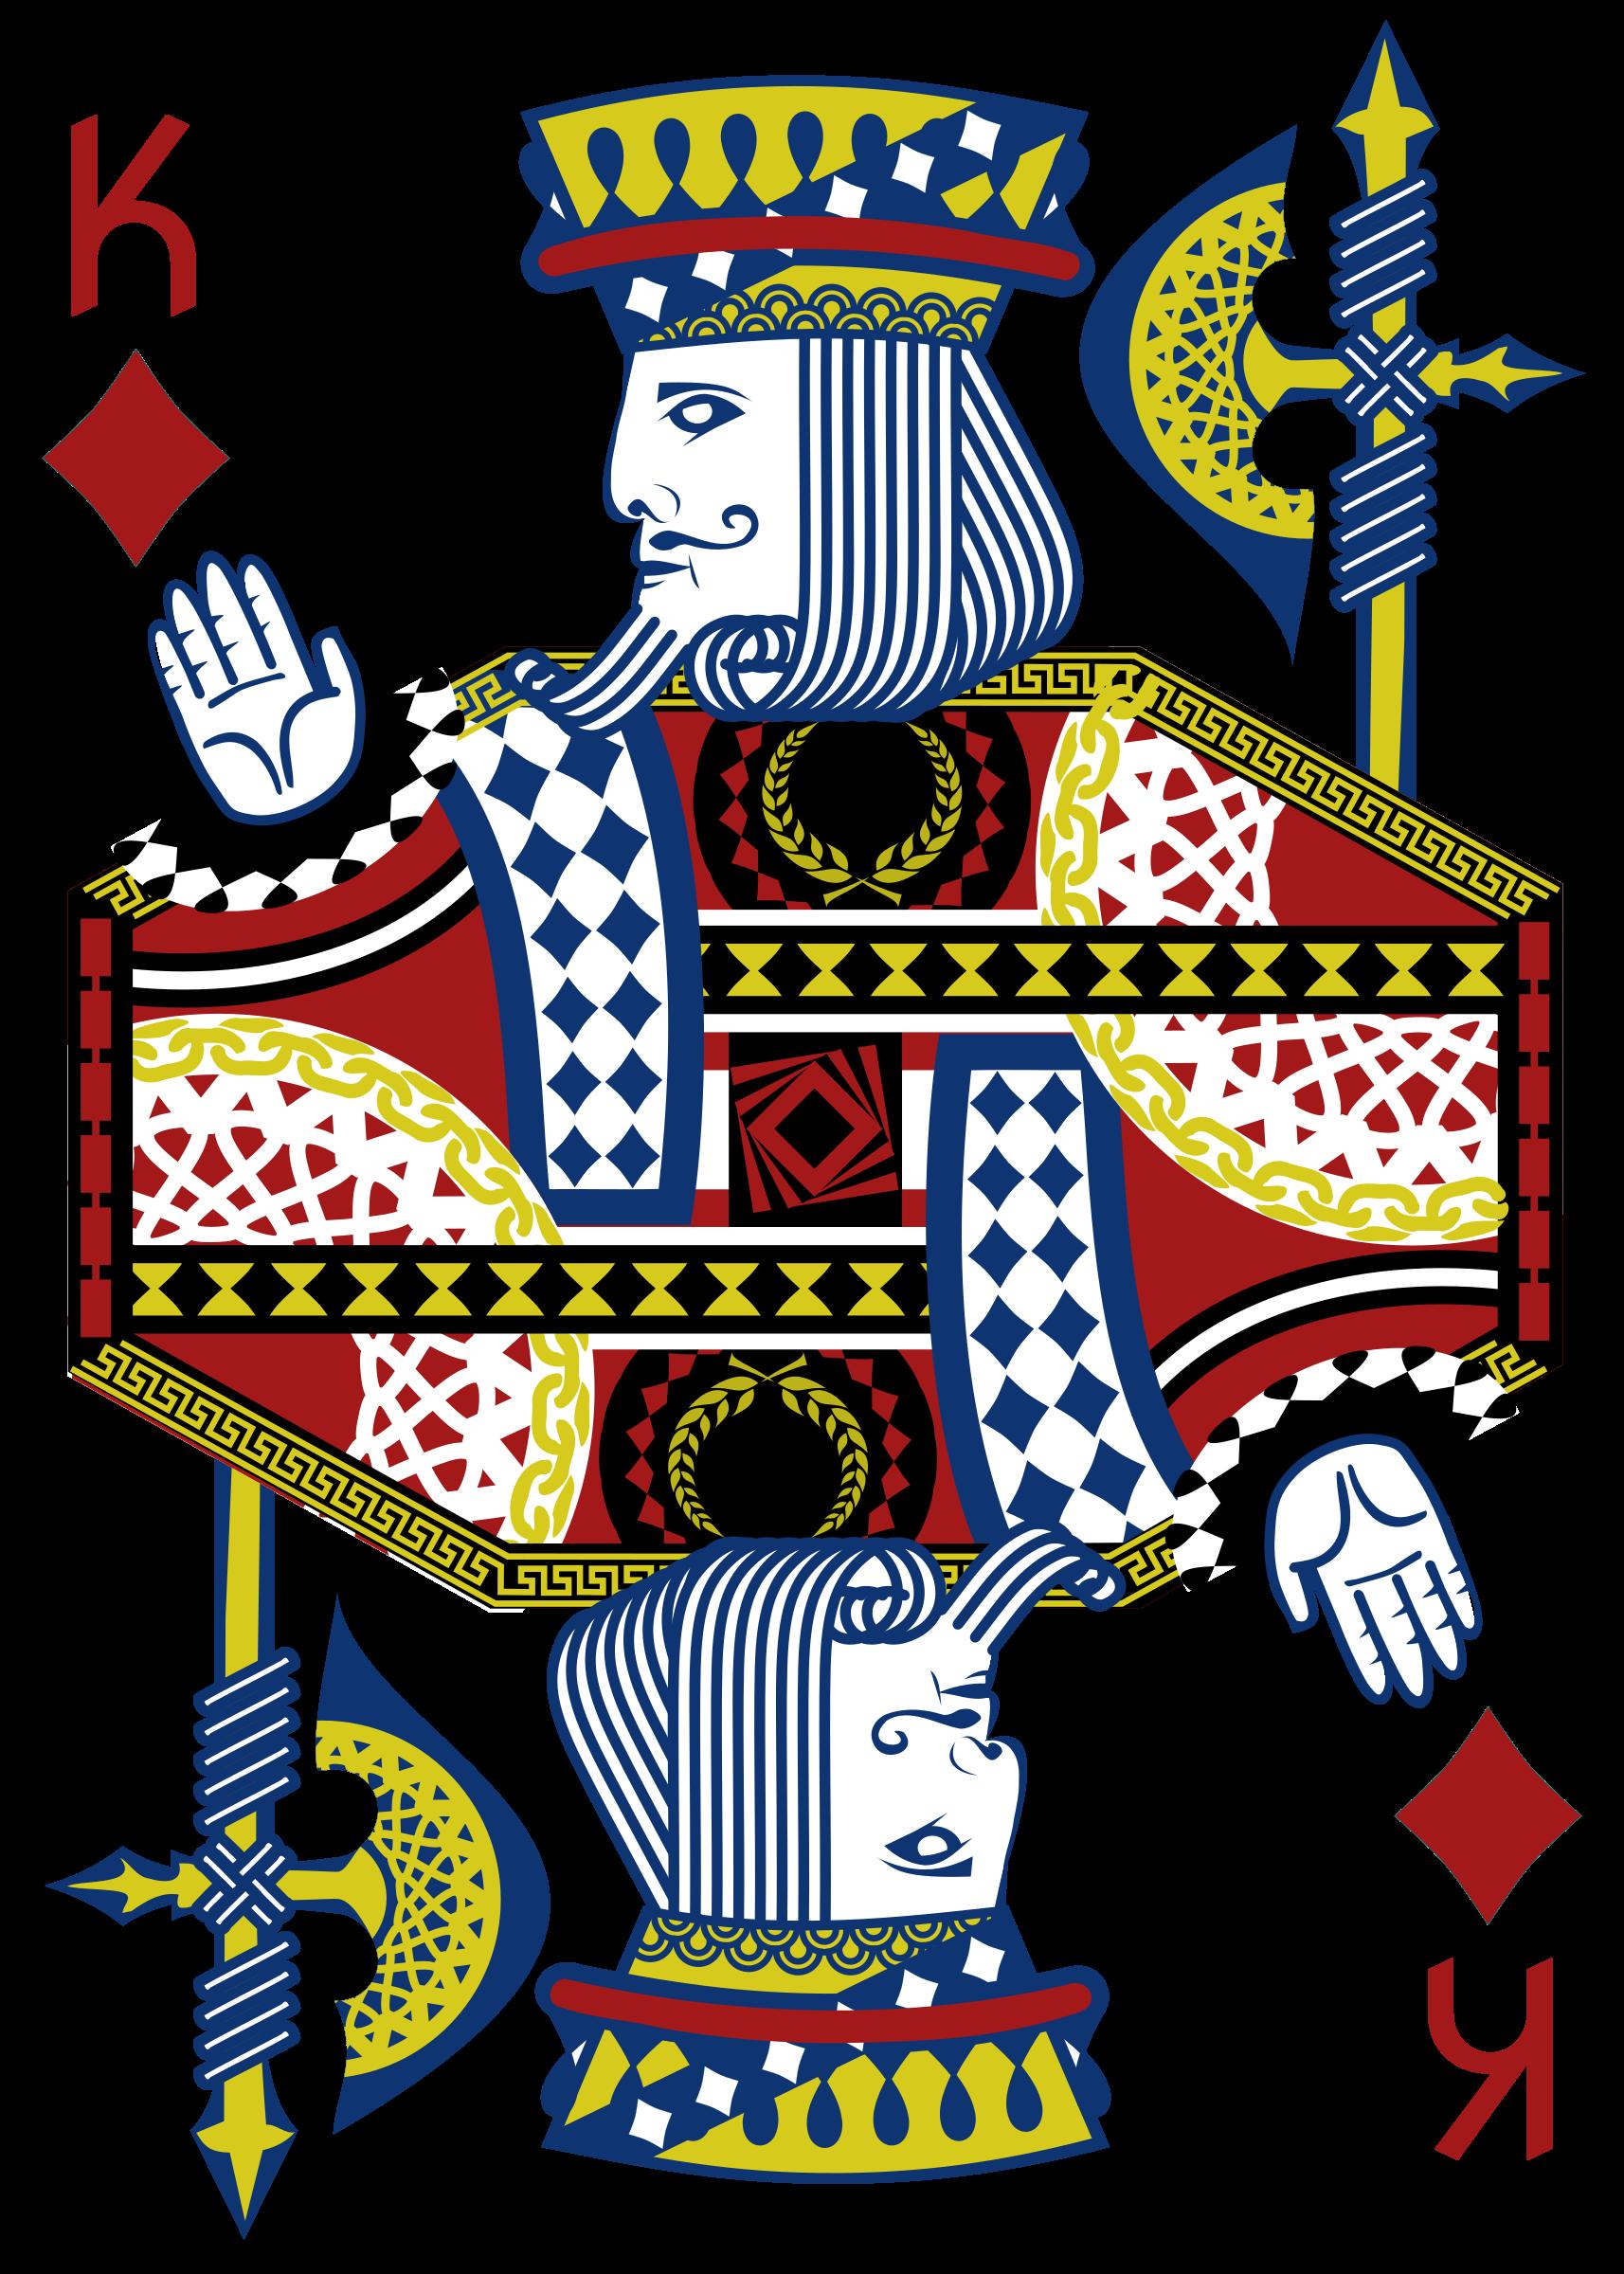 Diamond clipart card. King of diamonds lastdino